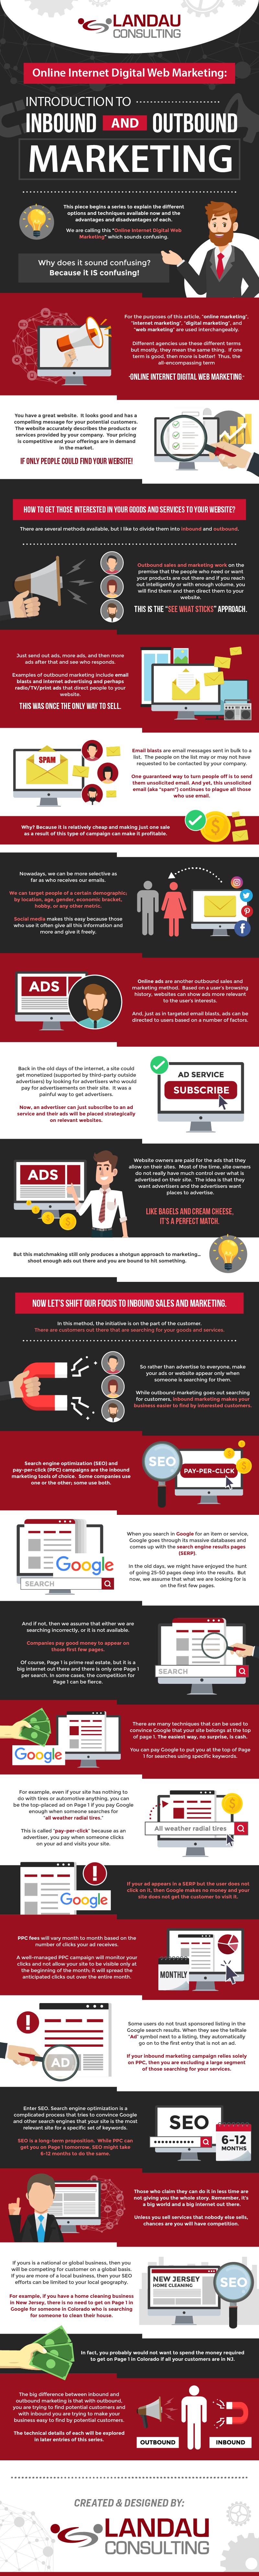 Online Internet Digital Web Marketing: Introduction to Inbound and Outbound Marketing